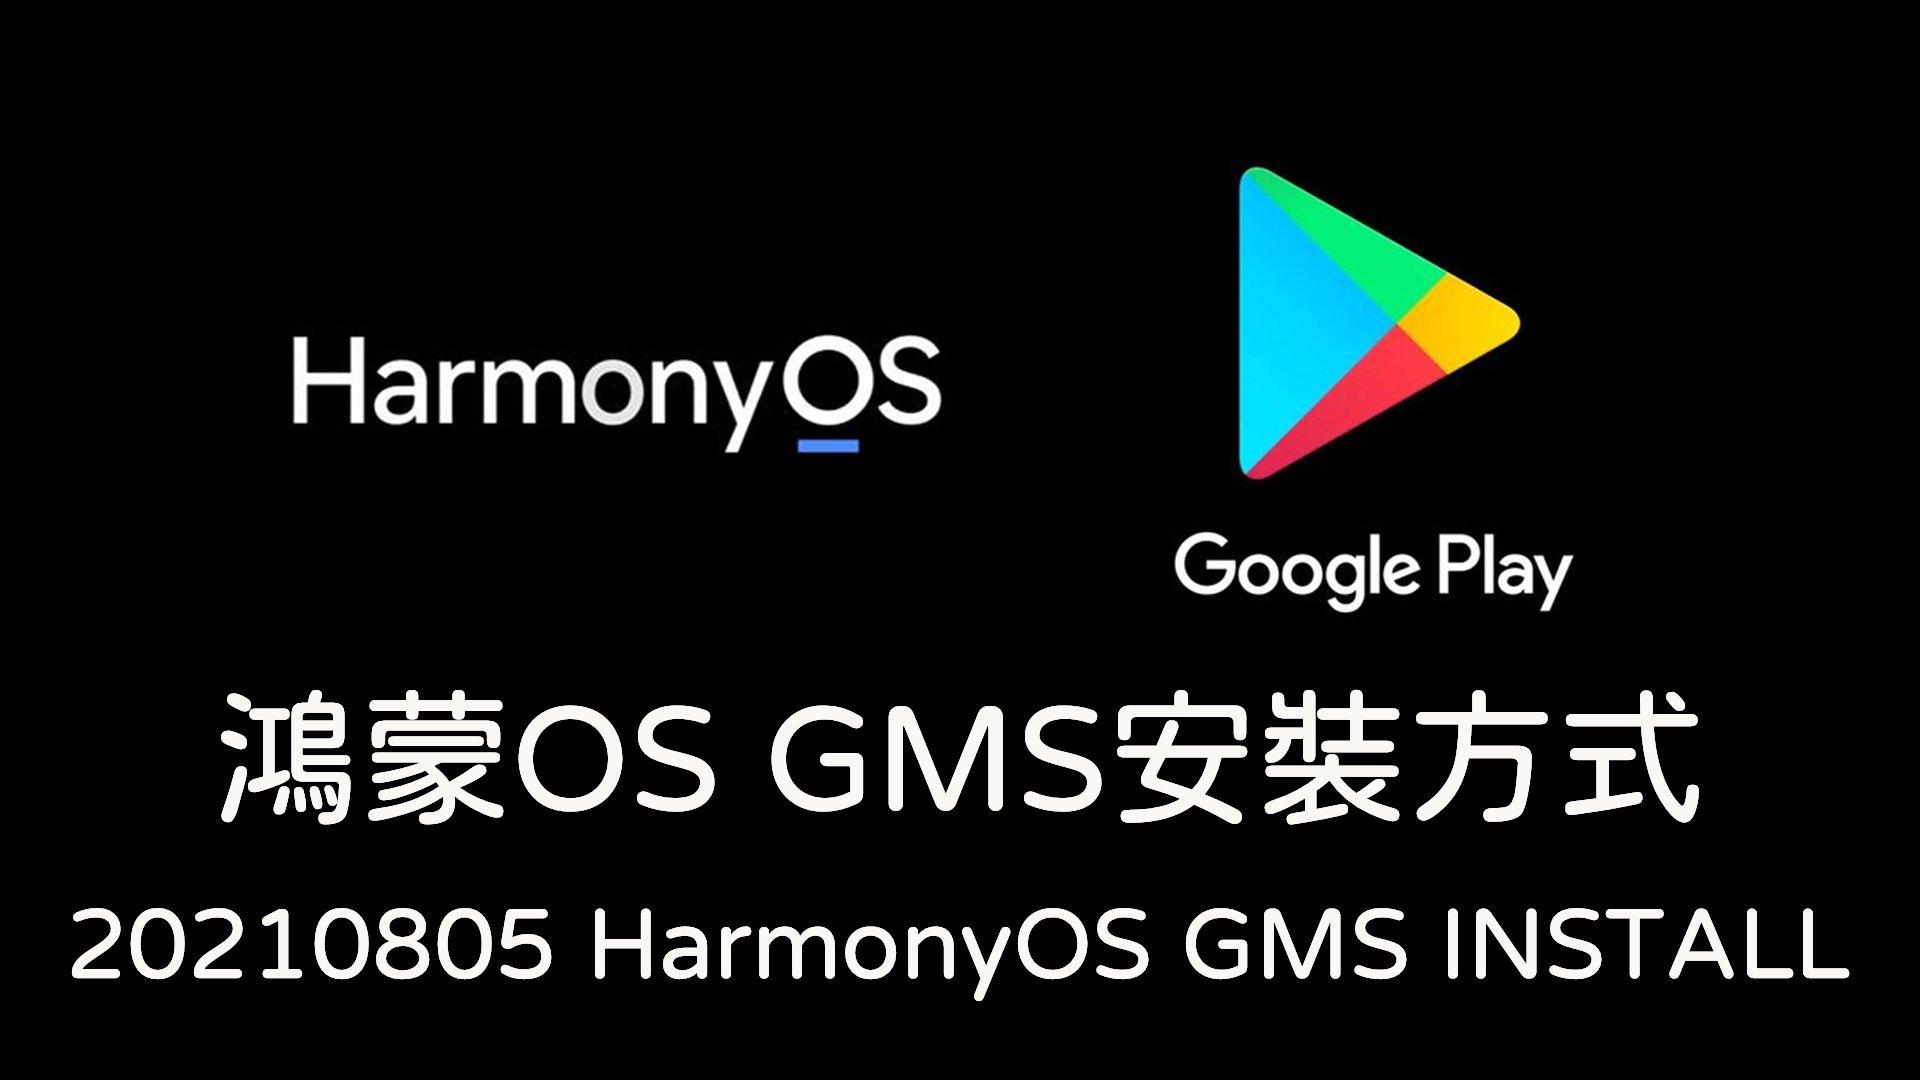 HarmonyOS Install Google Play Store 最新 GMS 安裝教學